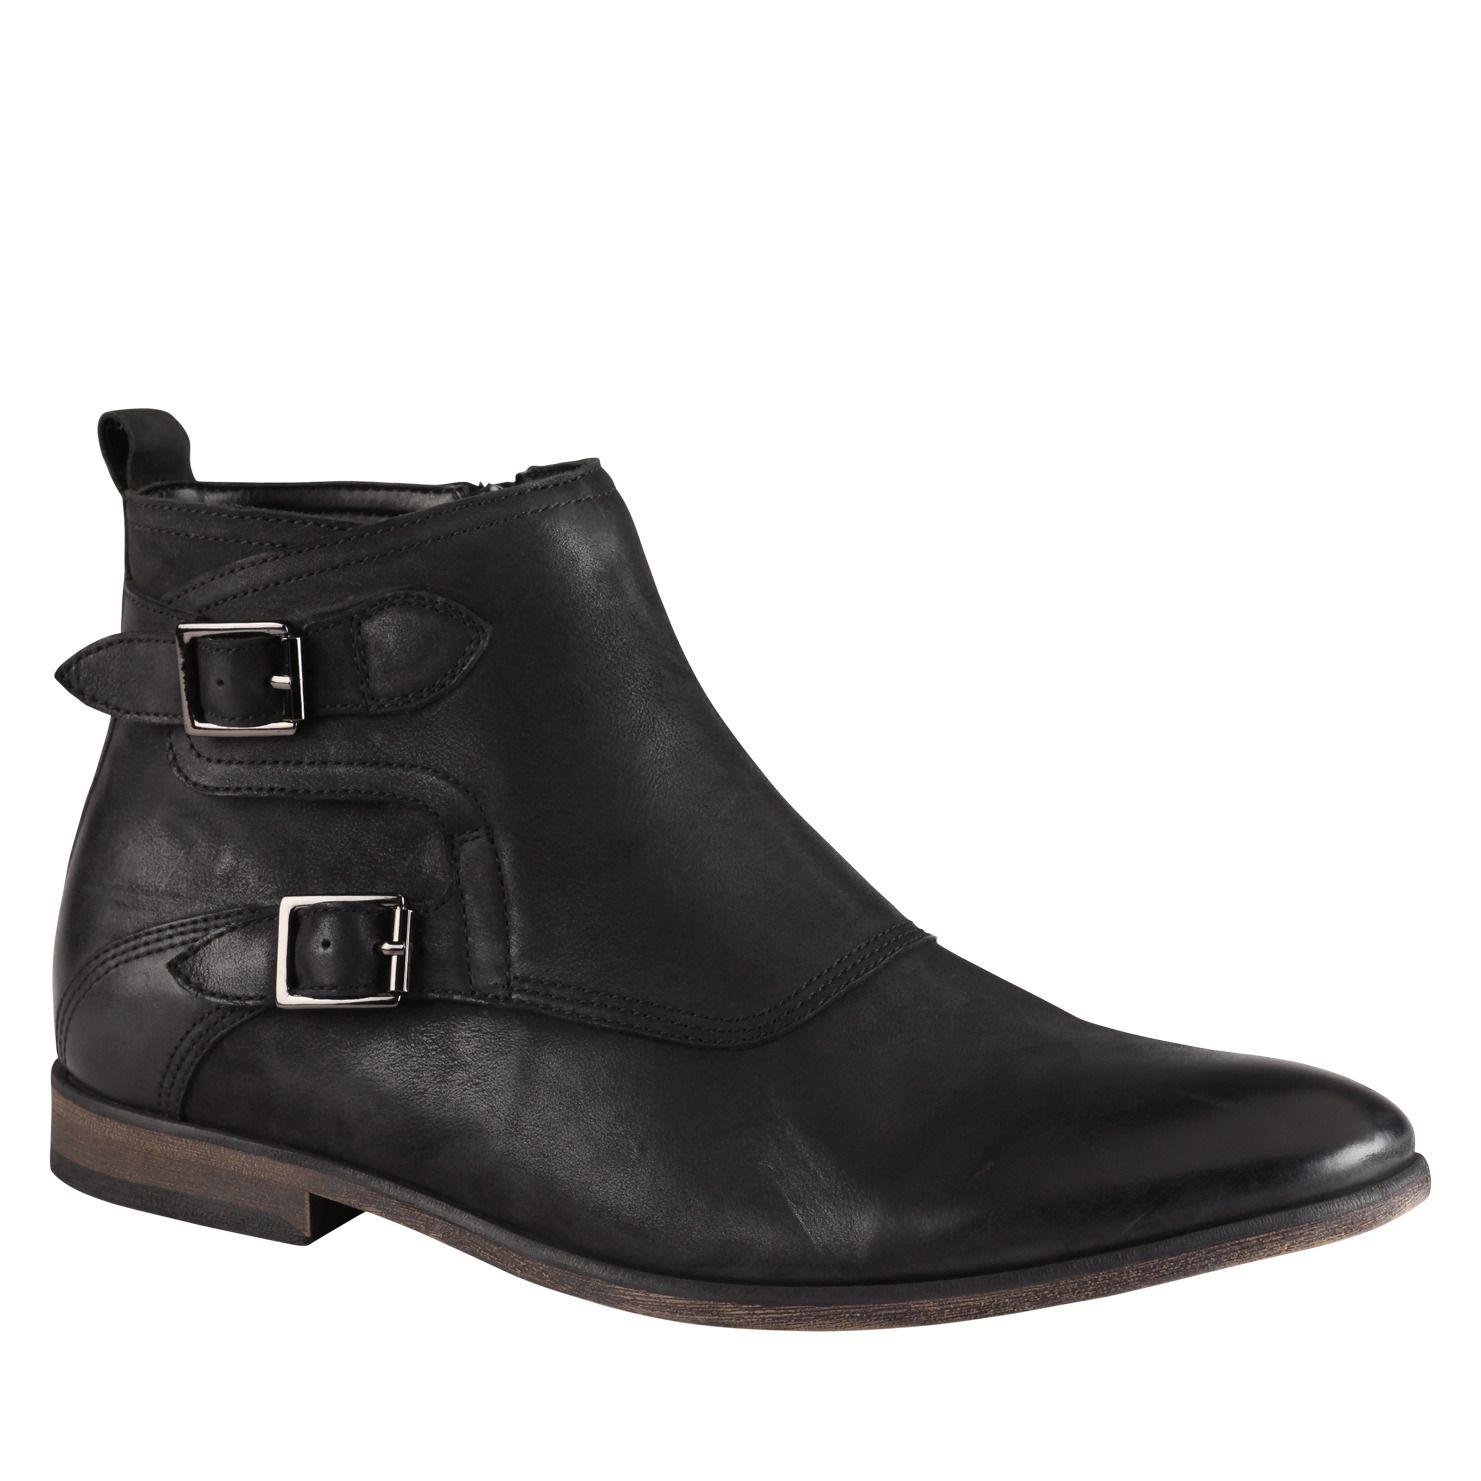 ALDO at men's dress for sale boots Shoes boots PEPPERELL sCohrxdtBQ